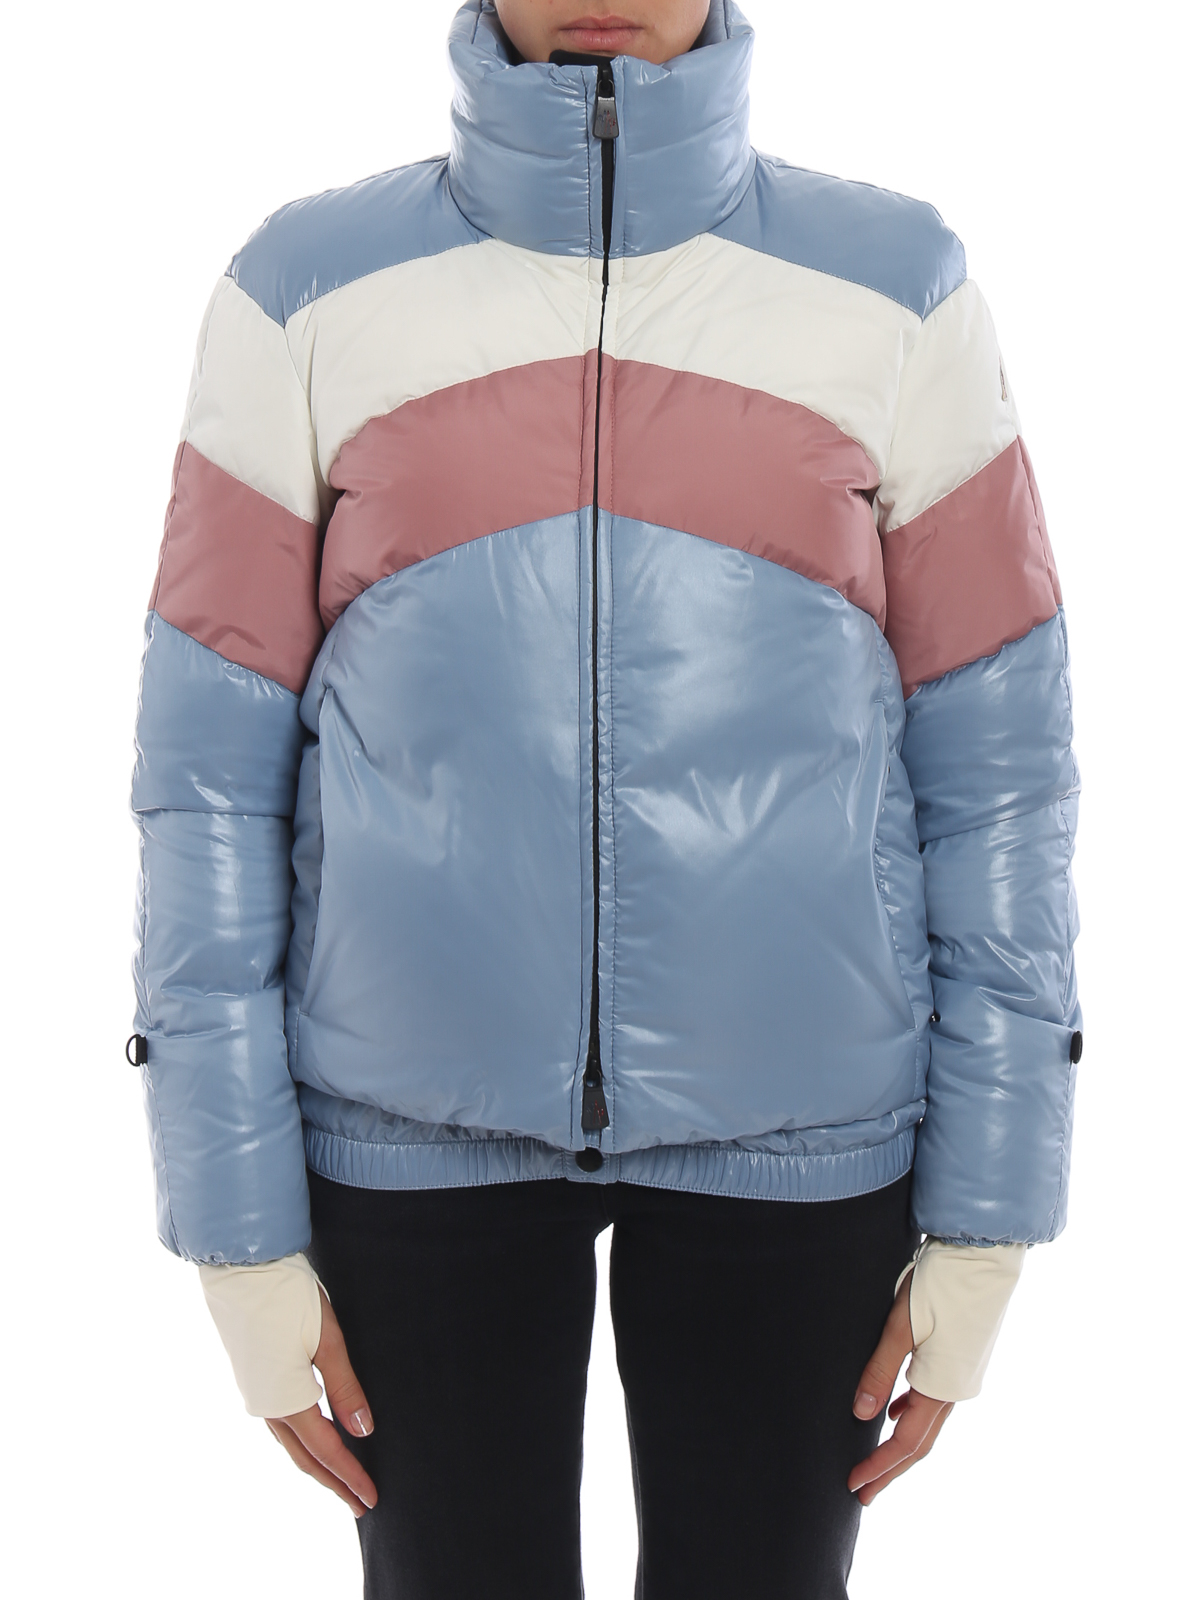 c75b64a45 Moncler Grenoble - Lamar chevron pattern puffer jacket - padded ...